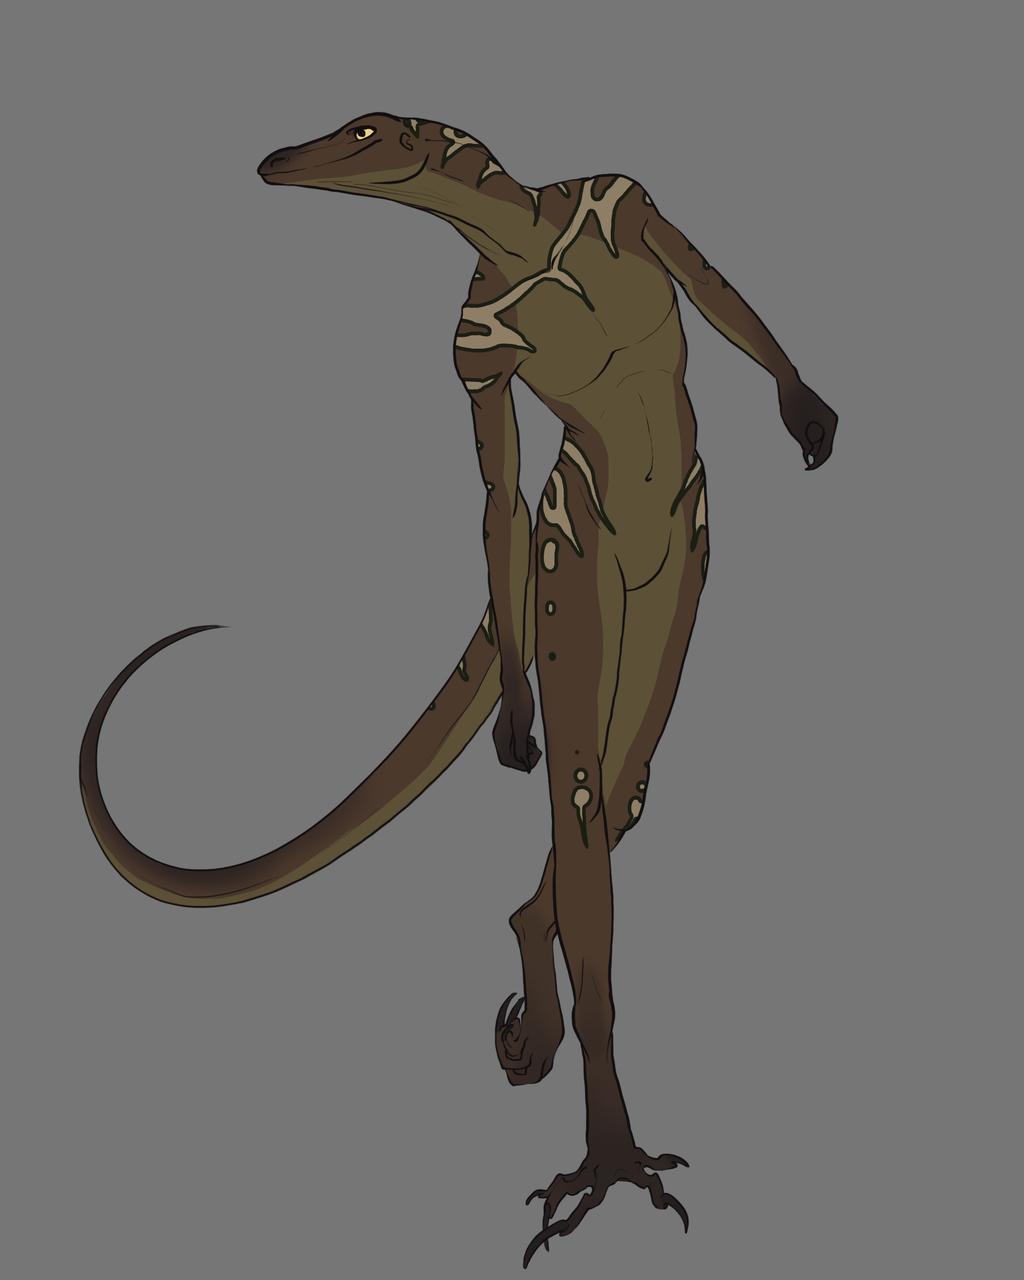 Most recent image: lizard